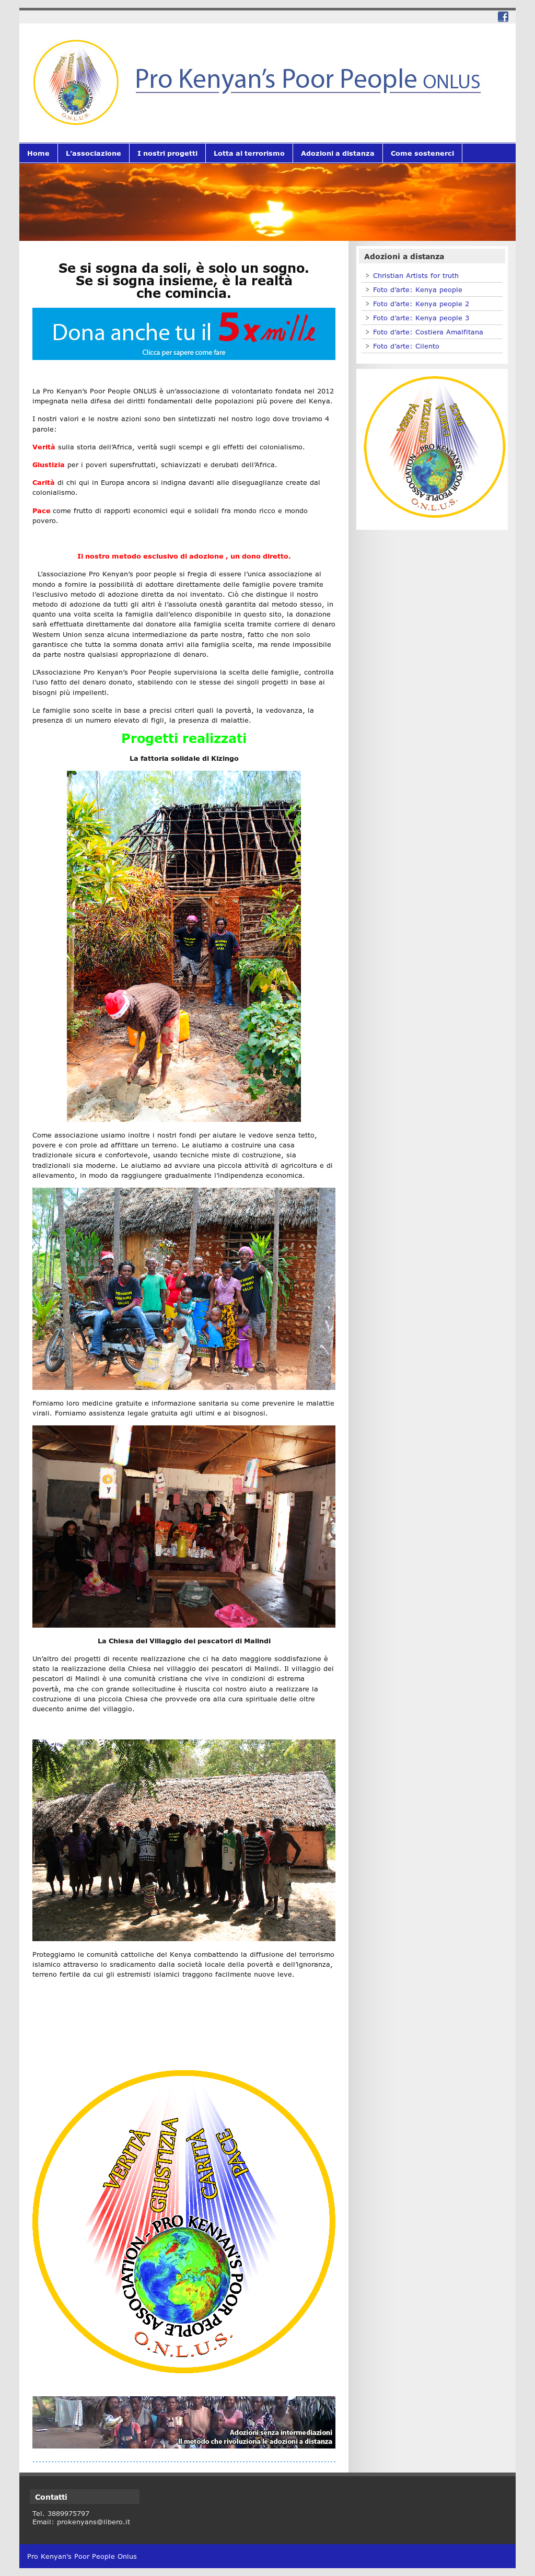 Come Realizzare Un Tetto Economico pro kenyan's poor people onlus competitors, revenue and